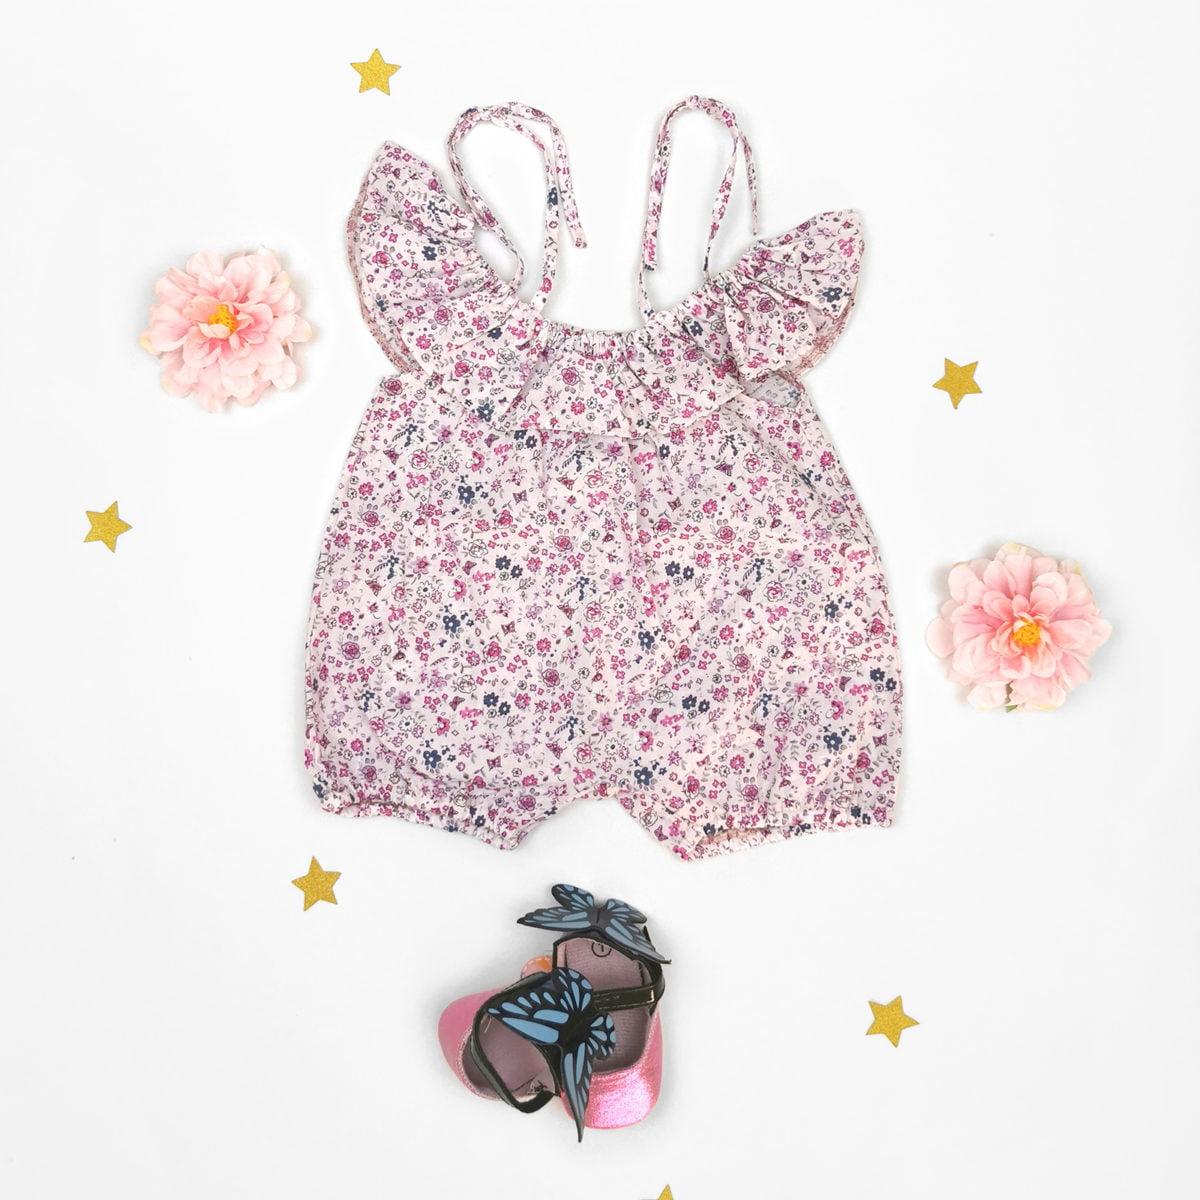 šareni daisy romper za male bebe